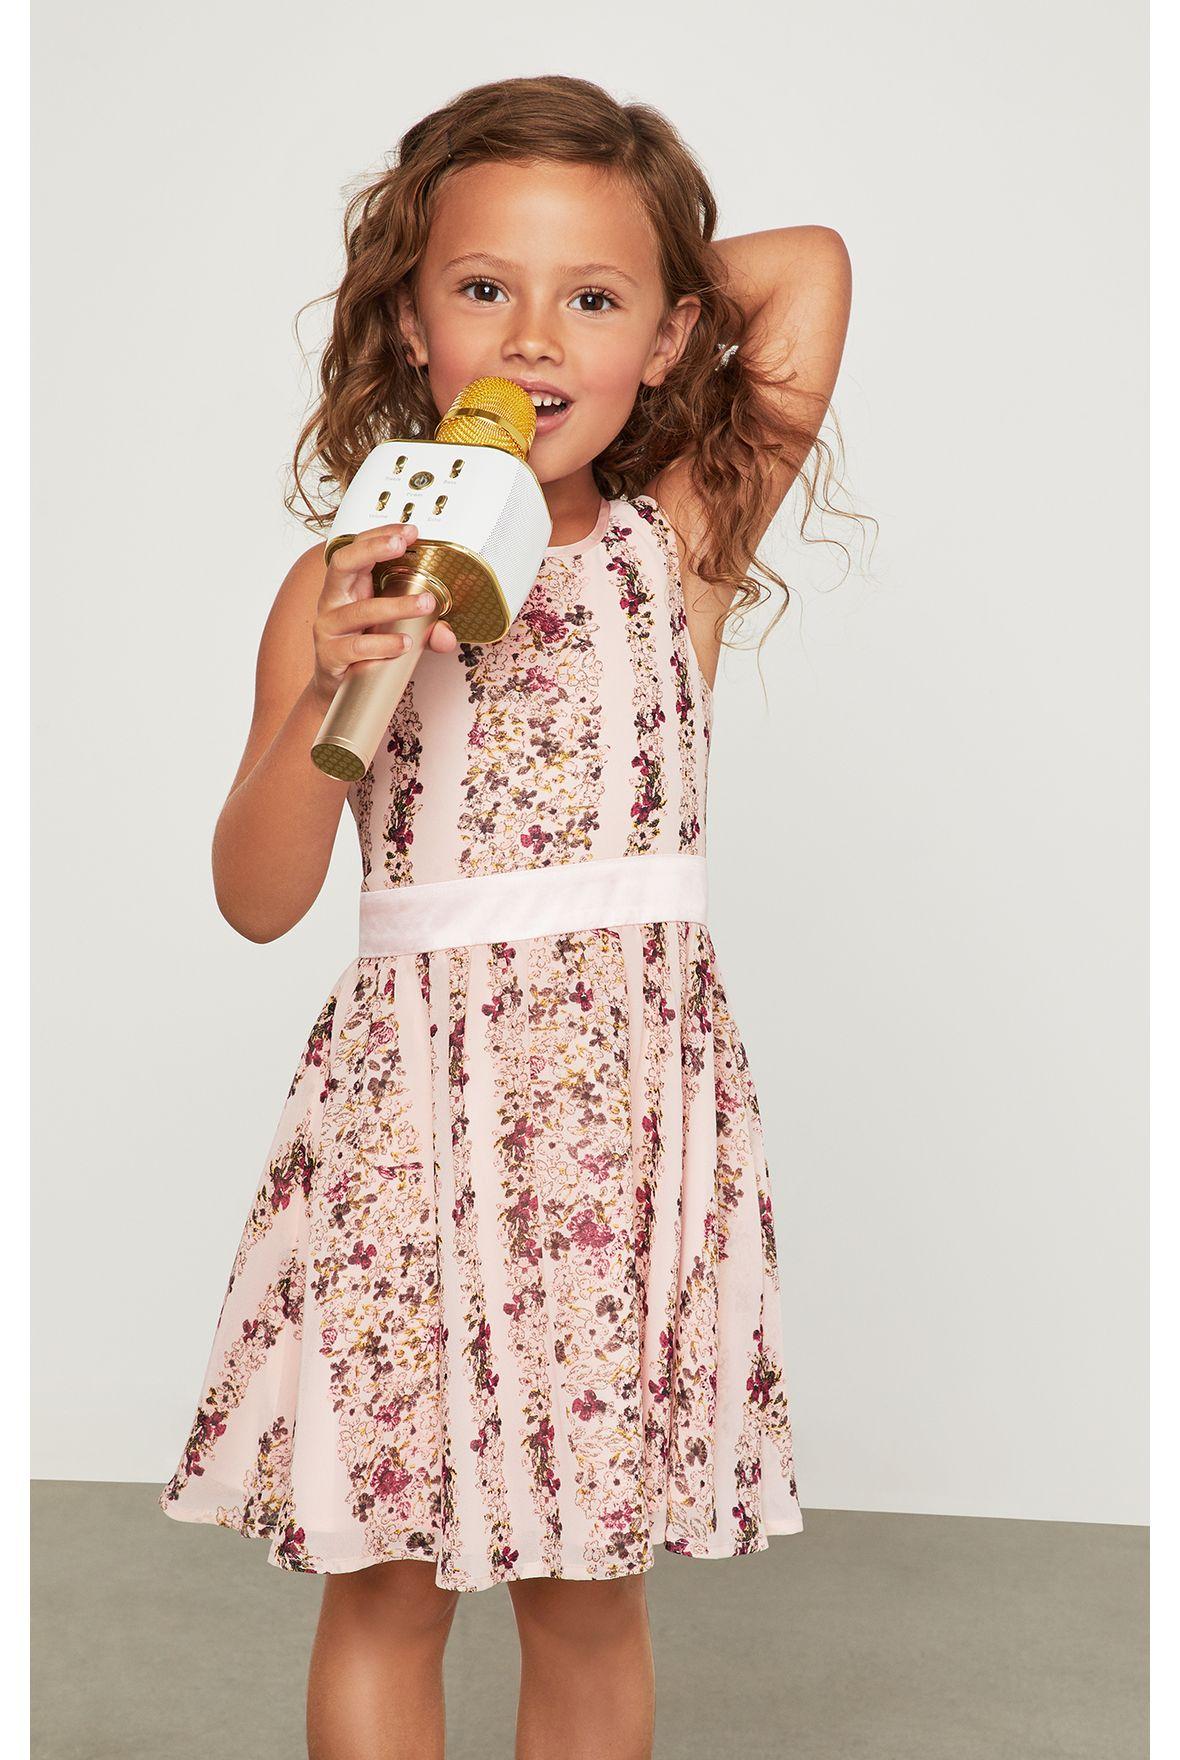 Vestido-BCBGirls-rosa-con-flores-B638DR205_RPL